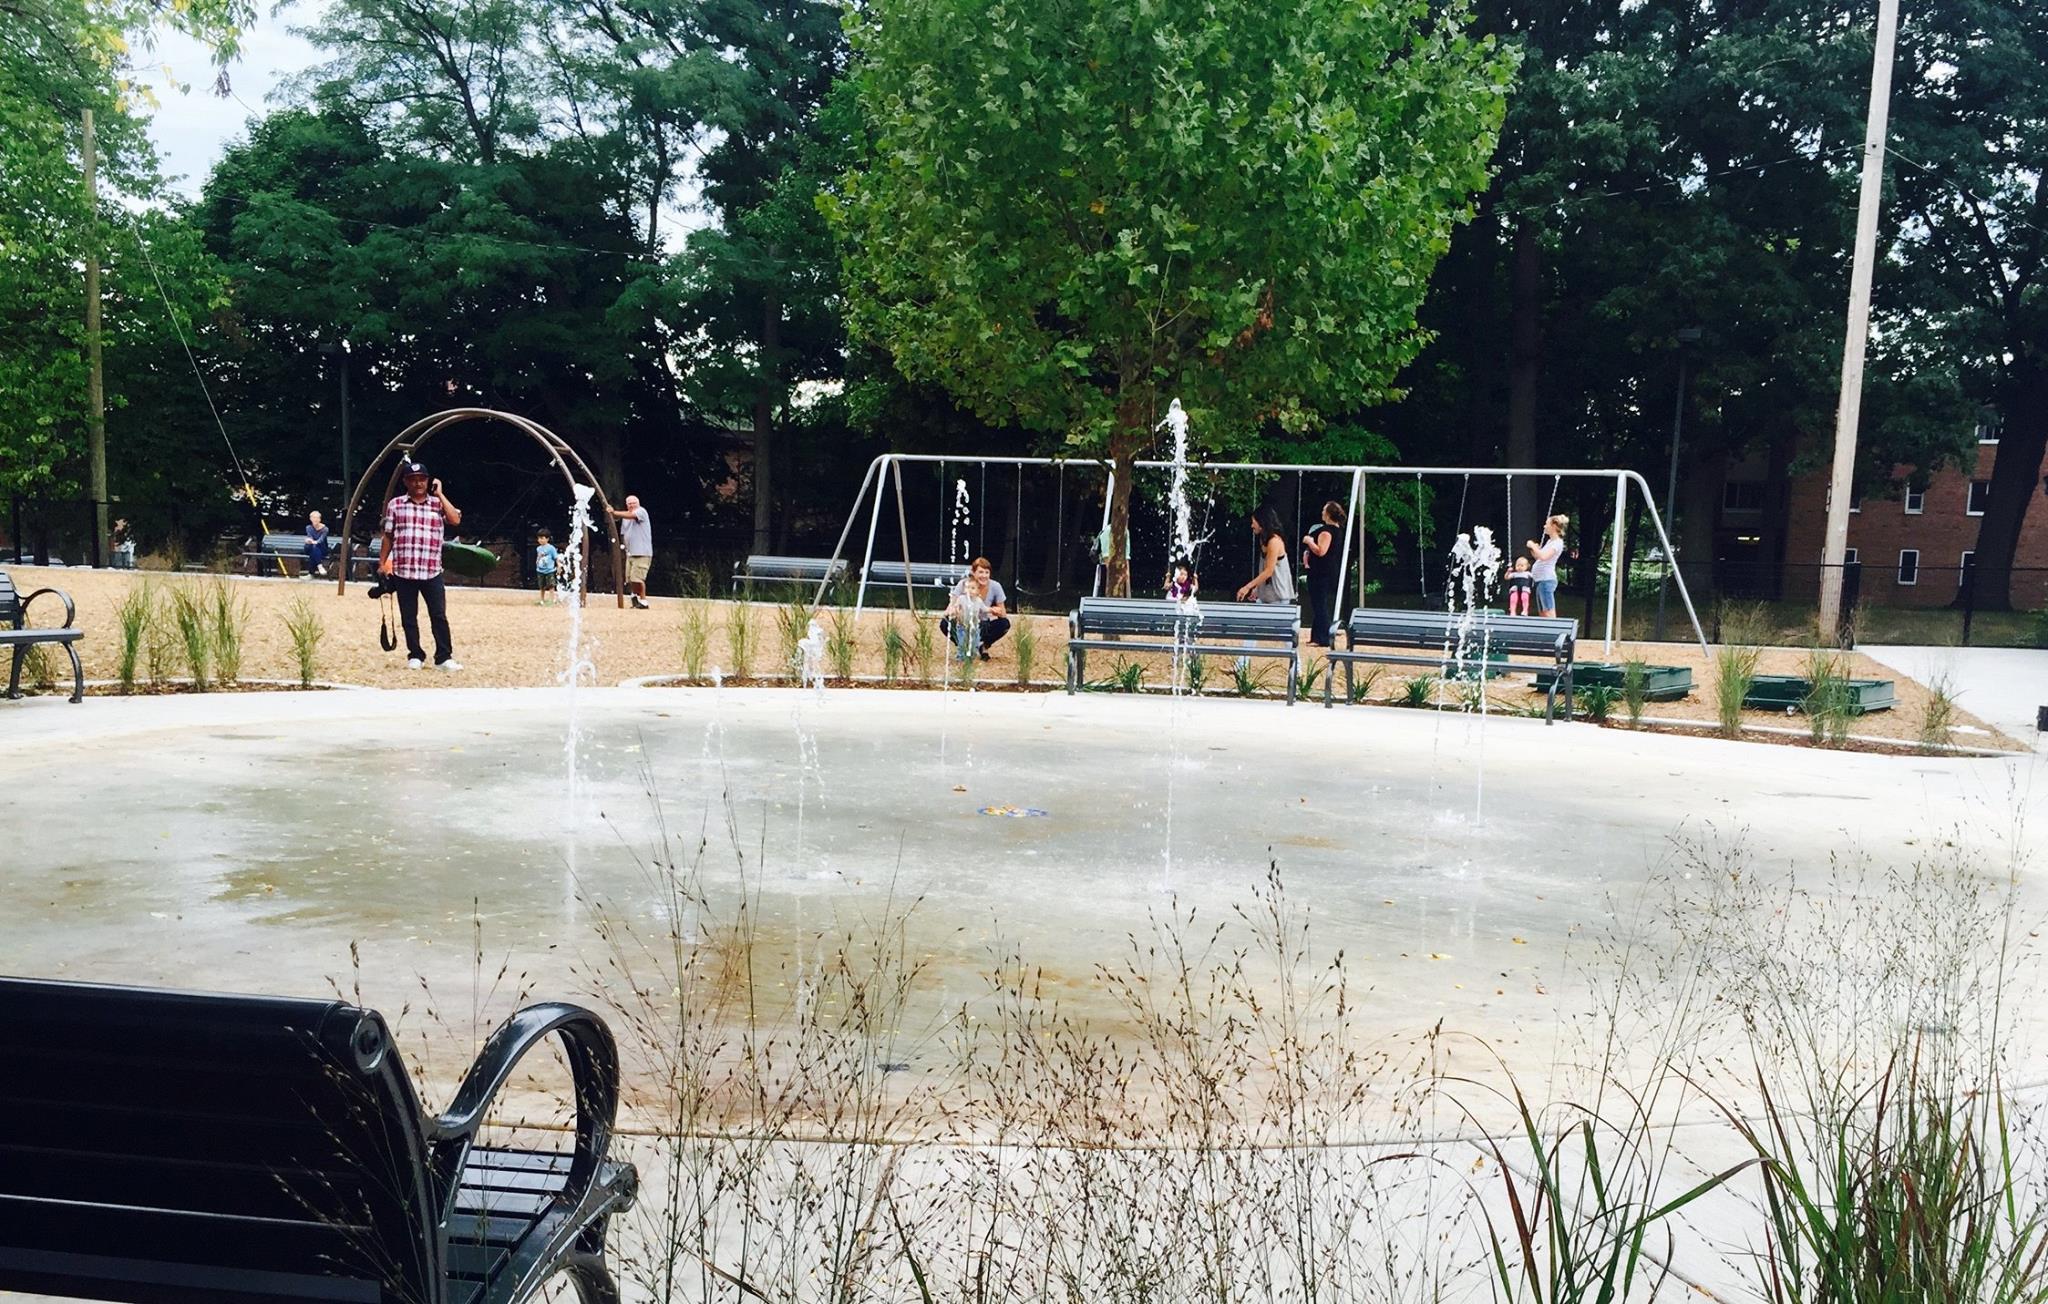 Grand Rapids Parks & Recreation Department